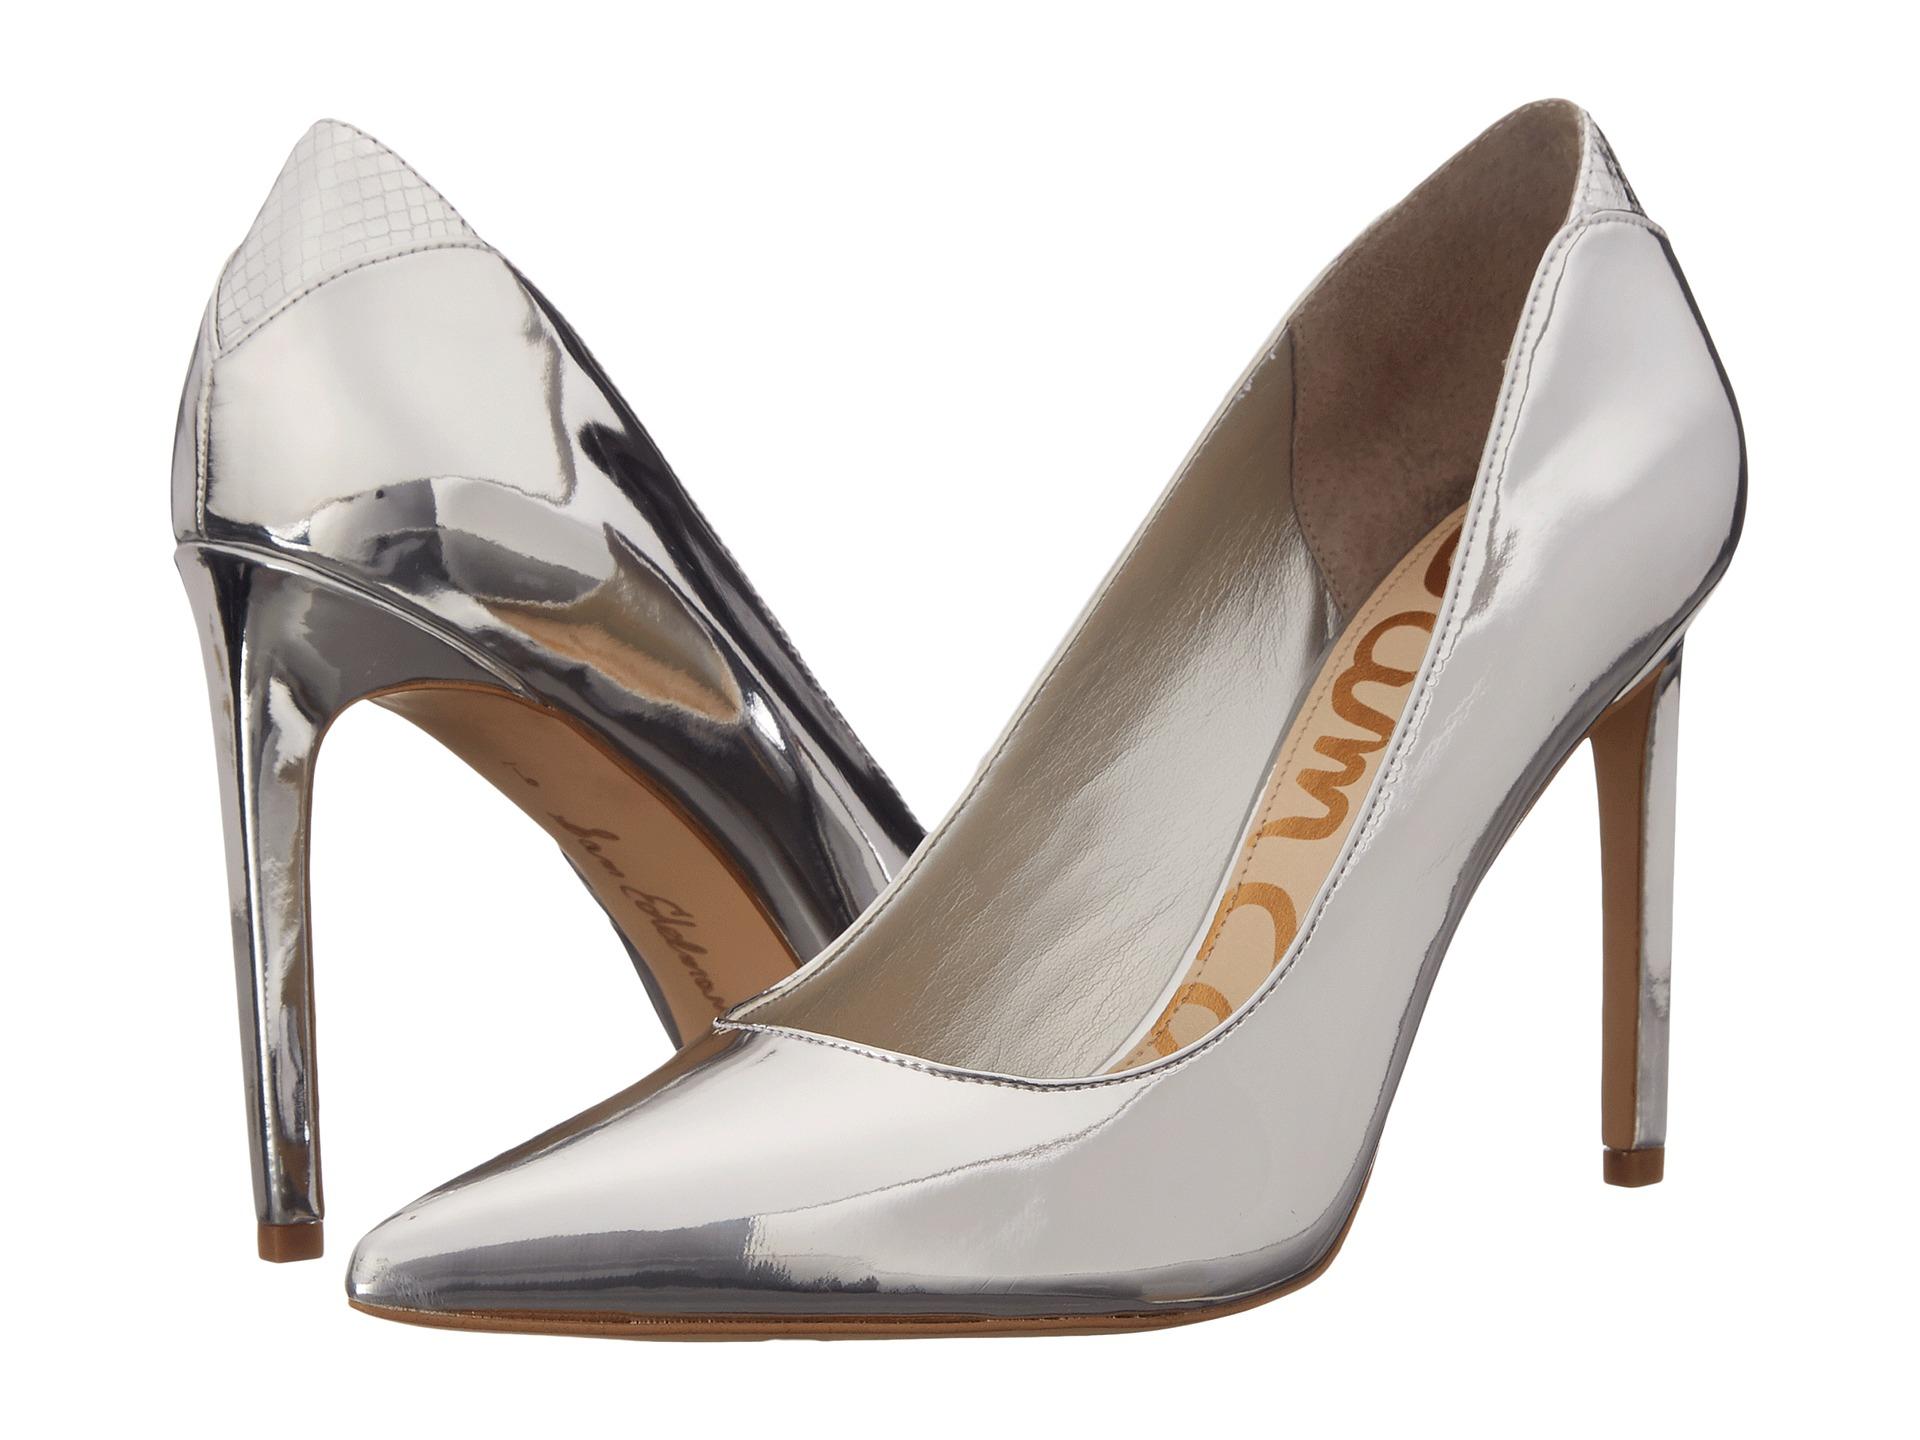 Sam Edelman DEA women's Court Shoes in Fashion Style Sale Online Free Shipping Visa Payment Factory Sale Nicekicks Online 0yVK6F0A